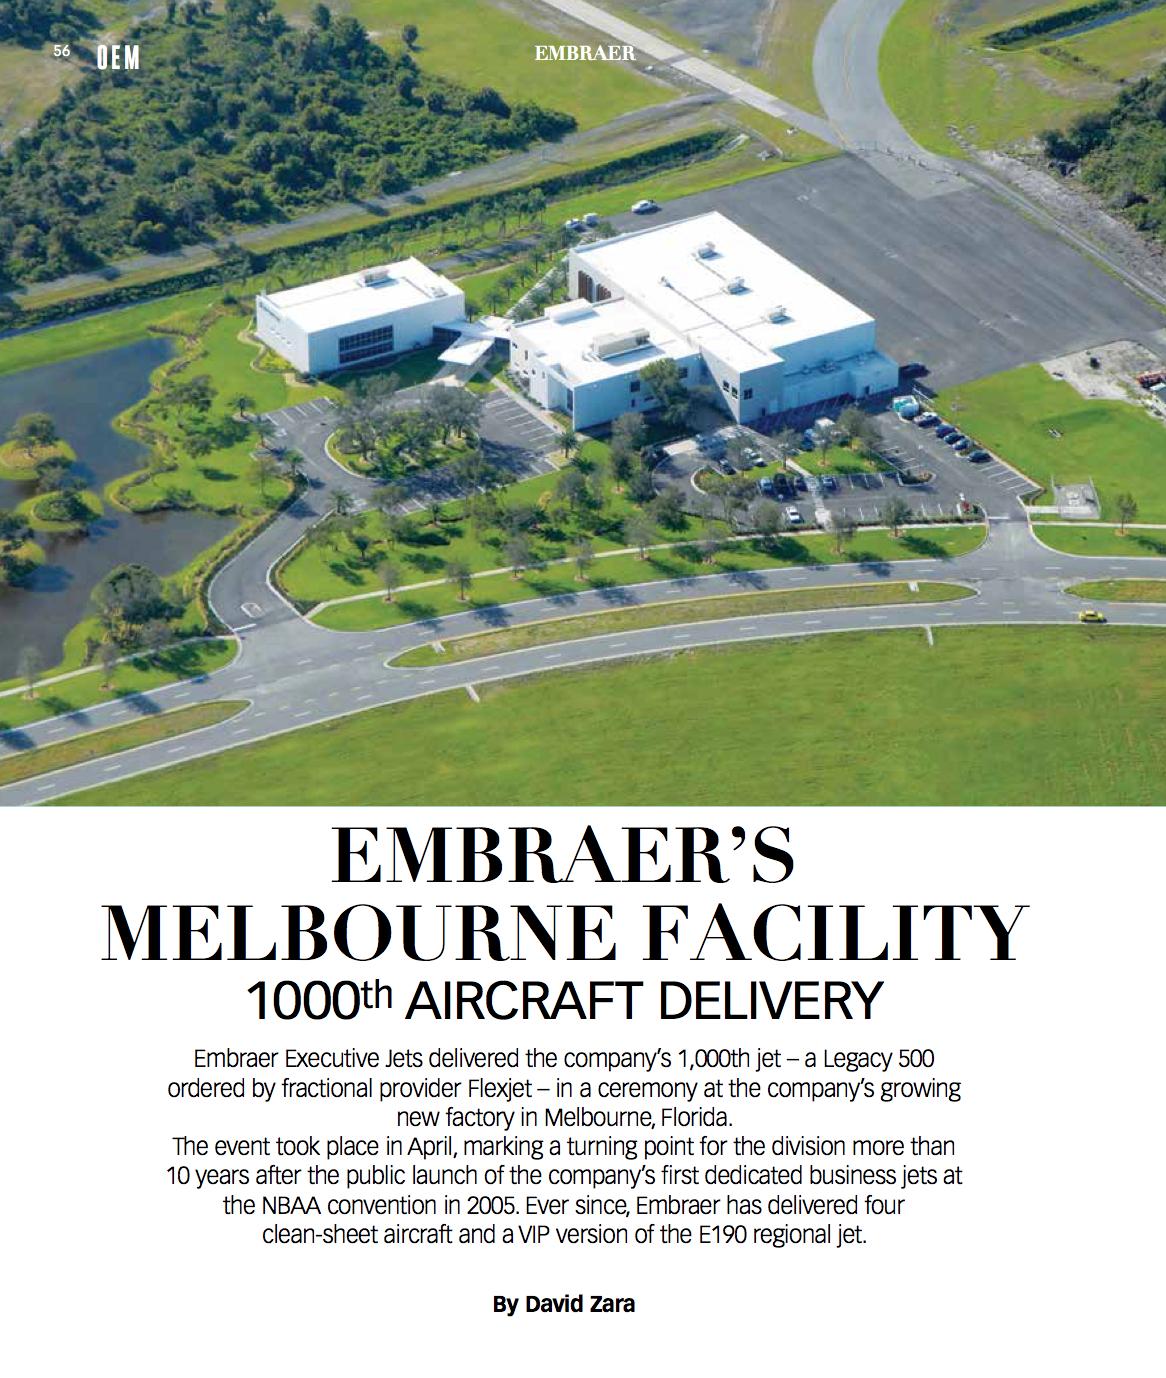 Embraer's Melbourne facility